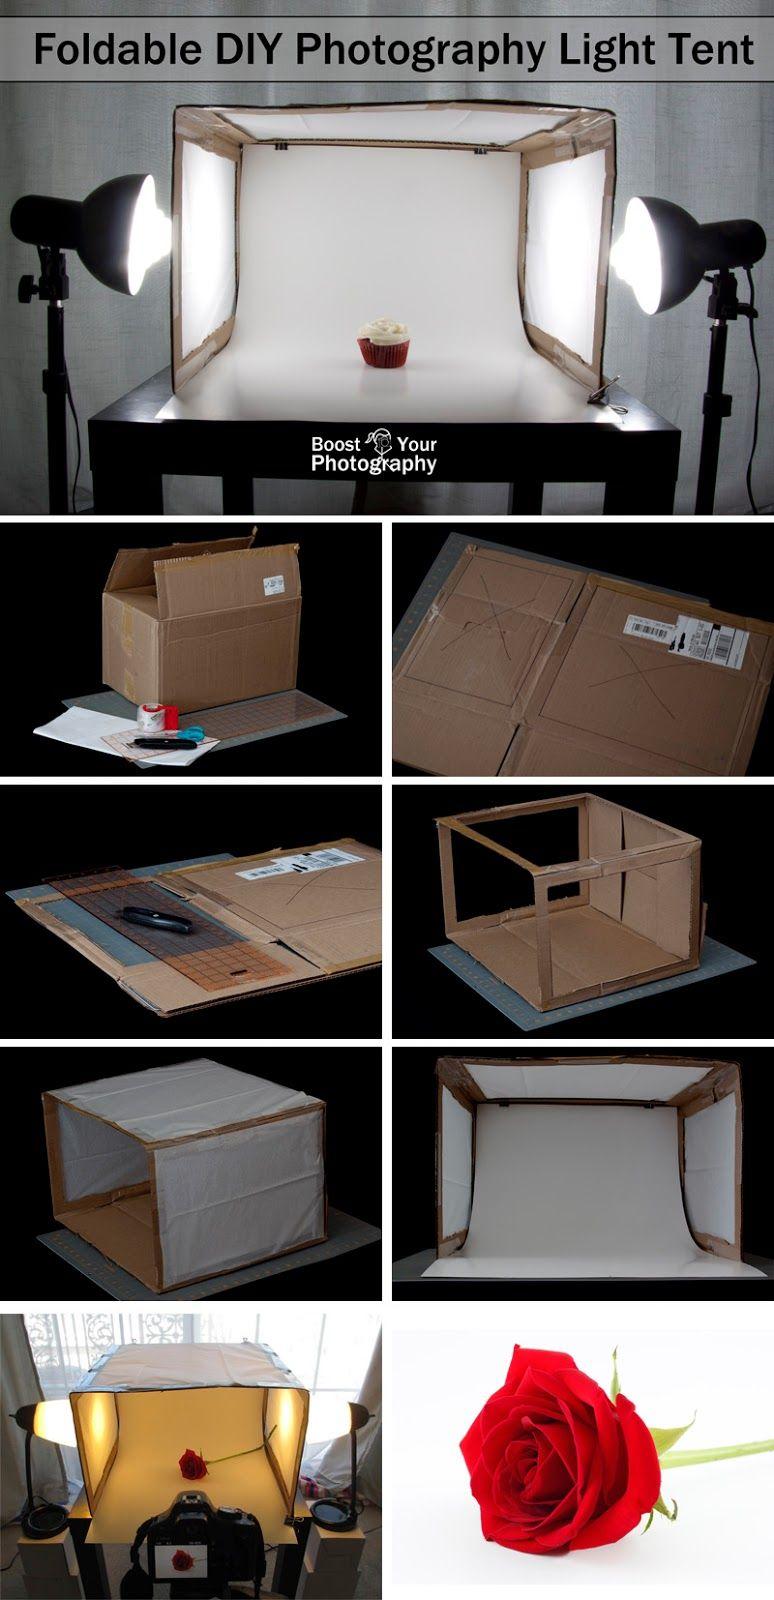 Foldable Diy Photography Light Tent Fotografie Fotografie Hacks Und Licht Fotografie